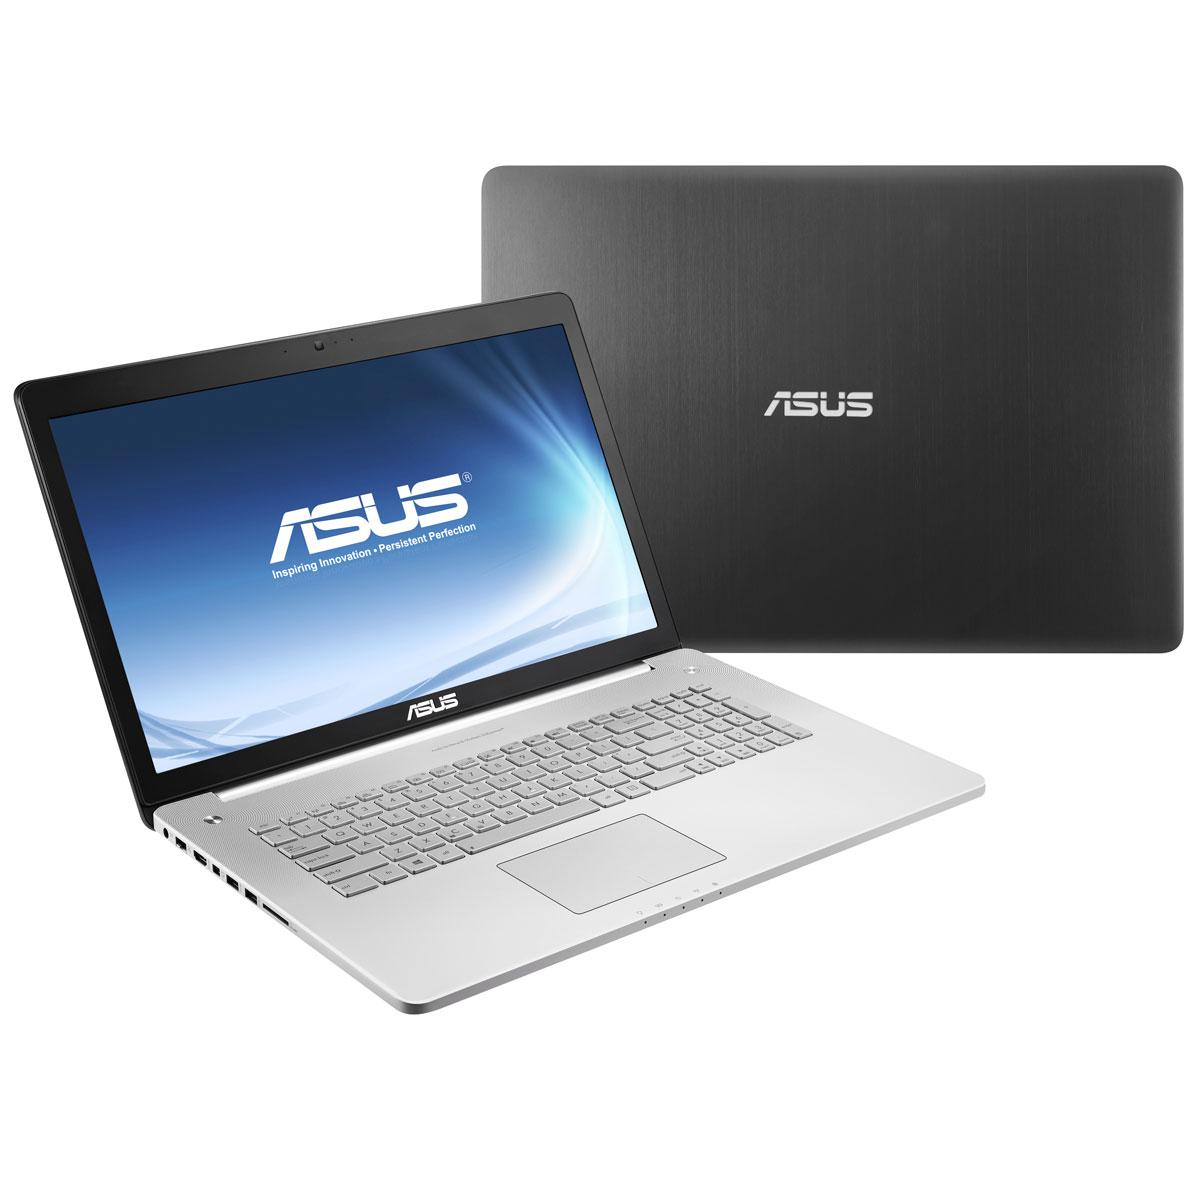 "PC portable ASUS N750JV-T4221H Intel Core i7-4700HQ 16 Go 1 To 17.3"" LED NVIDIA GeForce GT 750M Lecteur Blu-ray/Graveur DVD Wi-Fi N/Bluetooth Webcam Windows 8 64 bits (garantie constructeur 1 an)"